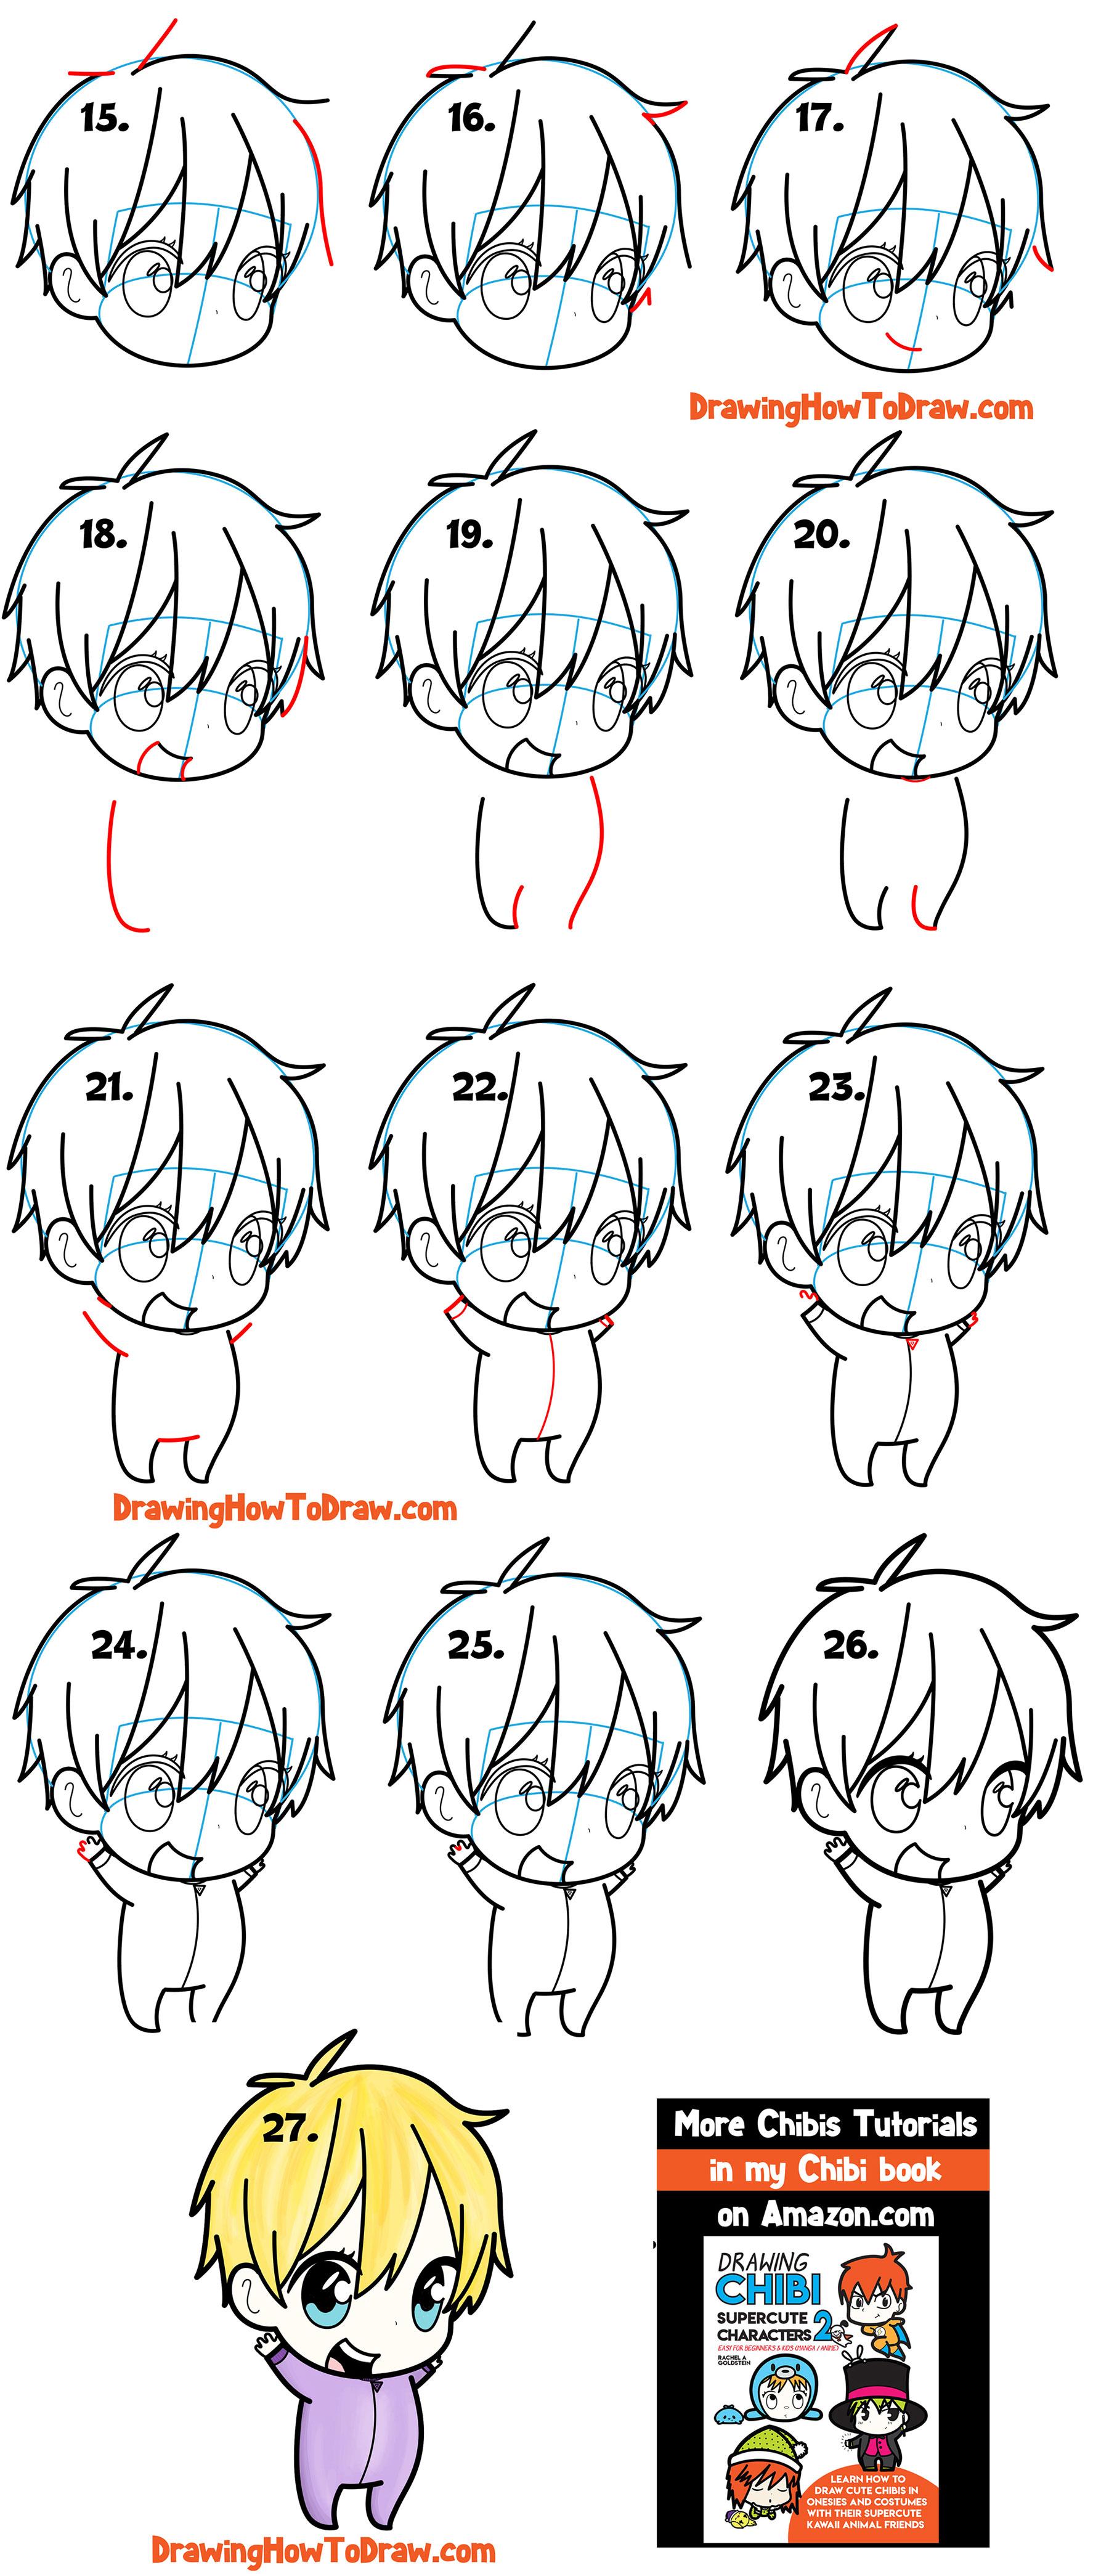 How To Draw A Chibi Boy : chibi, Chibi, Drawing, Tutorial, Beginners, Tutorials